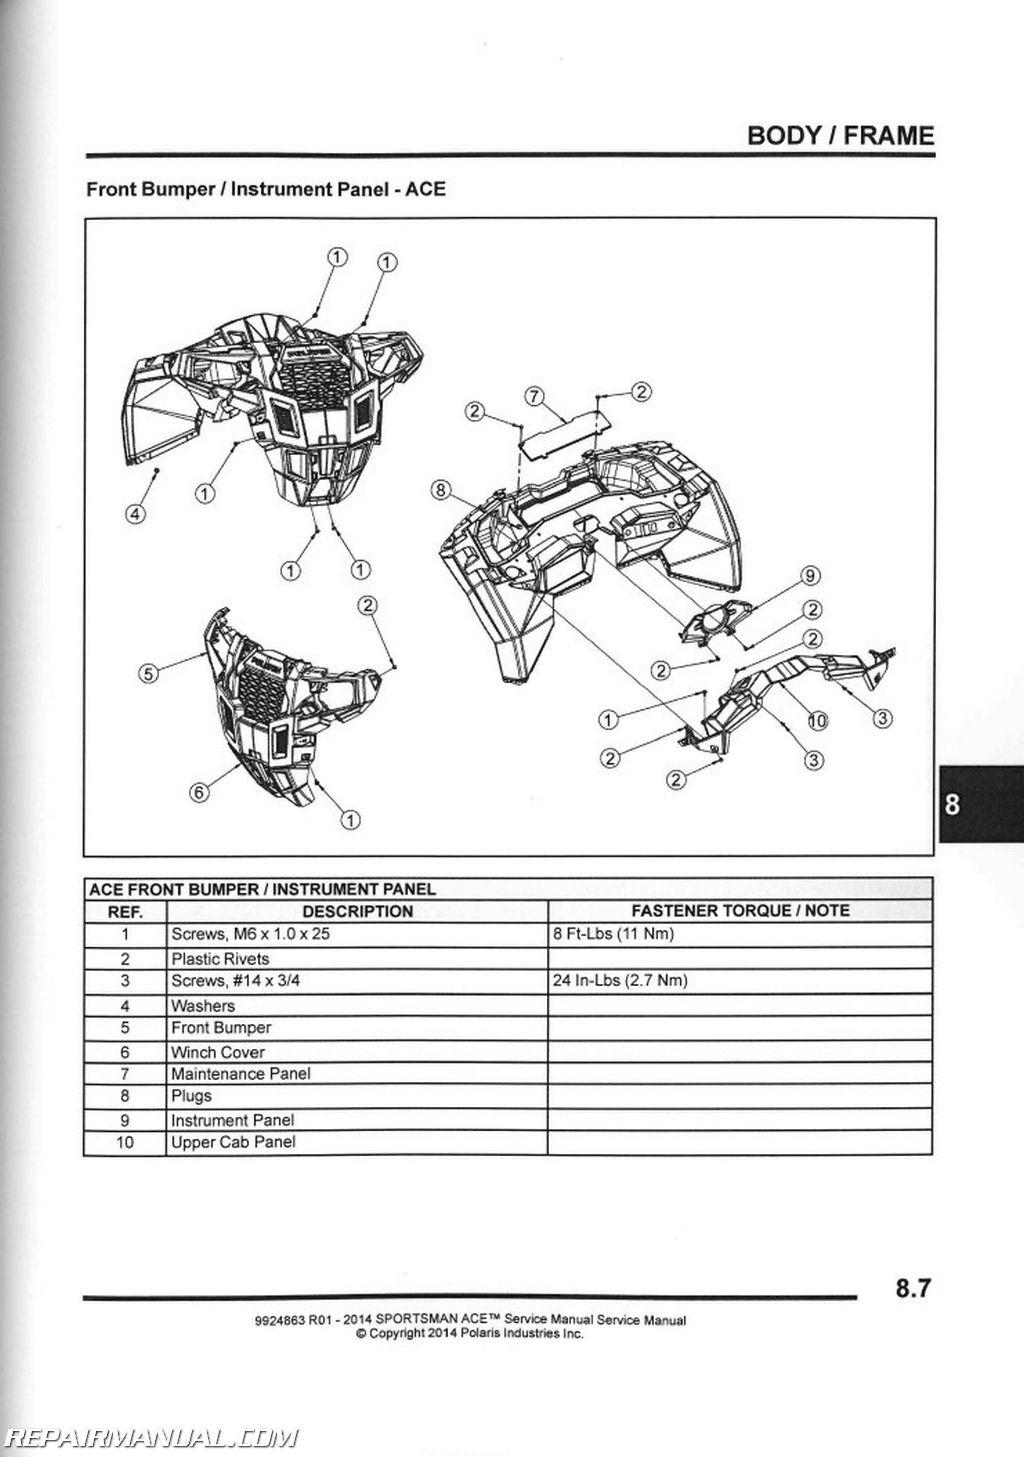 03 Polaris Sportsman 500 Winch Wiring Diagram Electrical 400 Fuel Filter 2007 Scrambler Reviewmotors Co 2010 Ranger